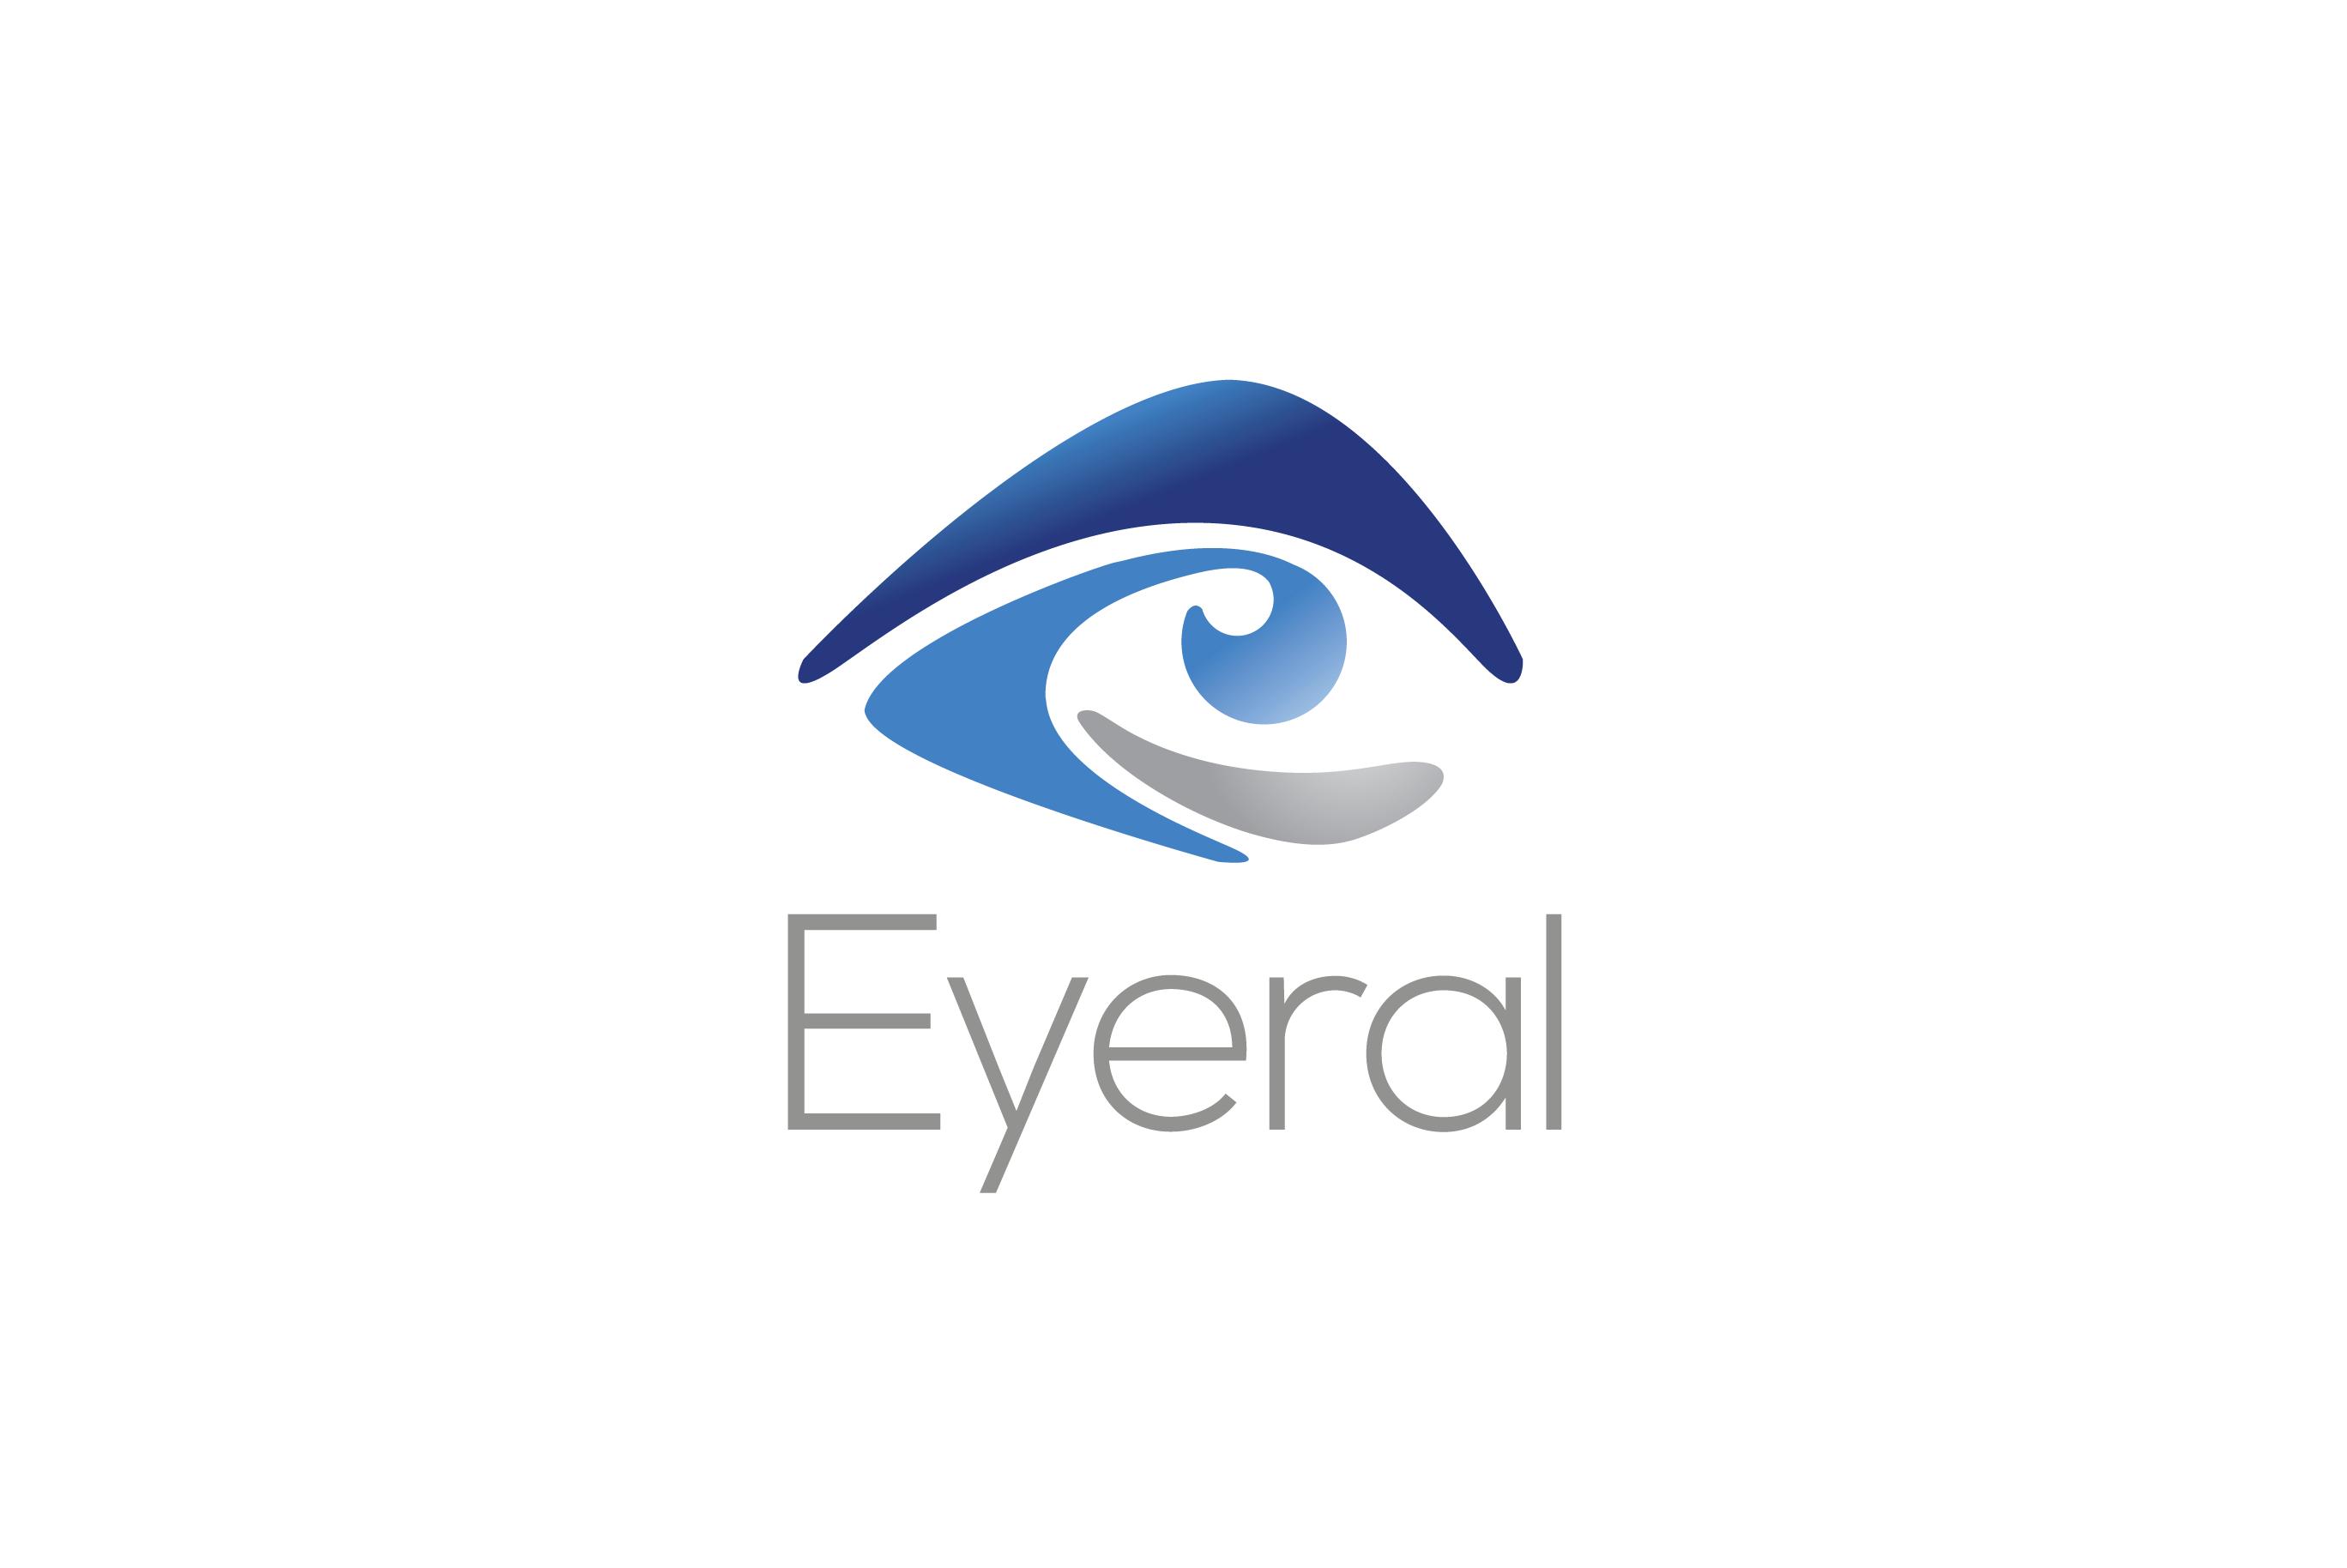 Eyeral Eye Logo Design | Logo Cowboy